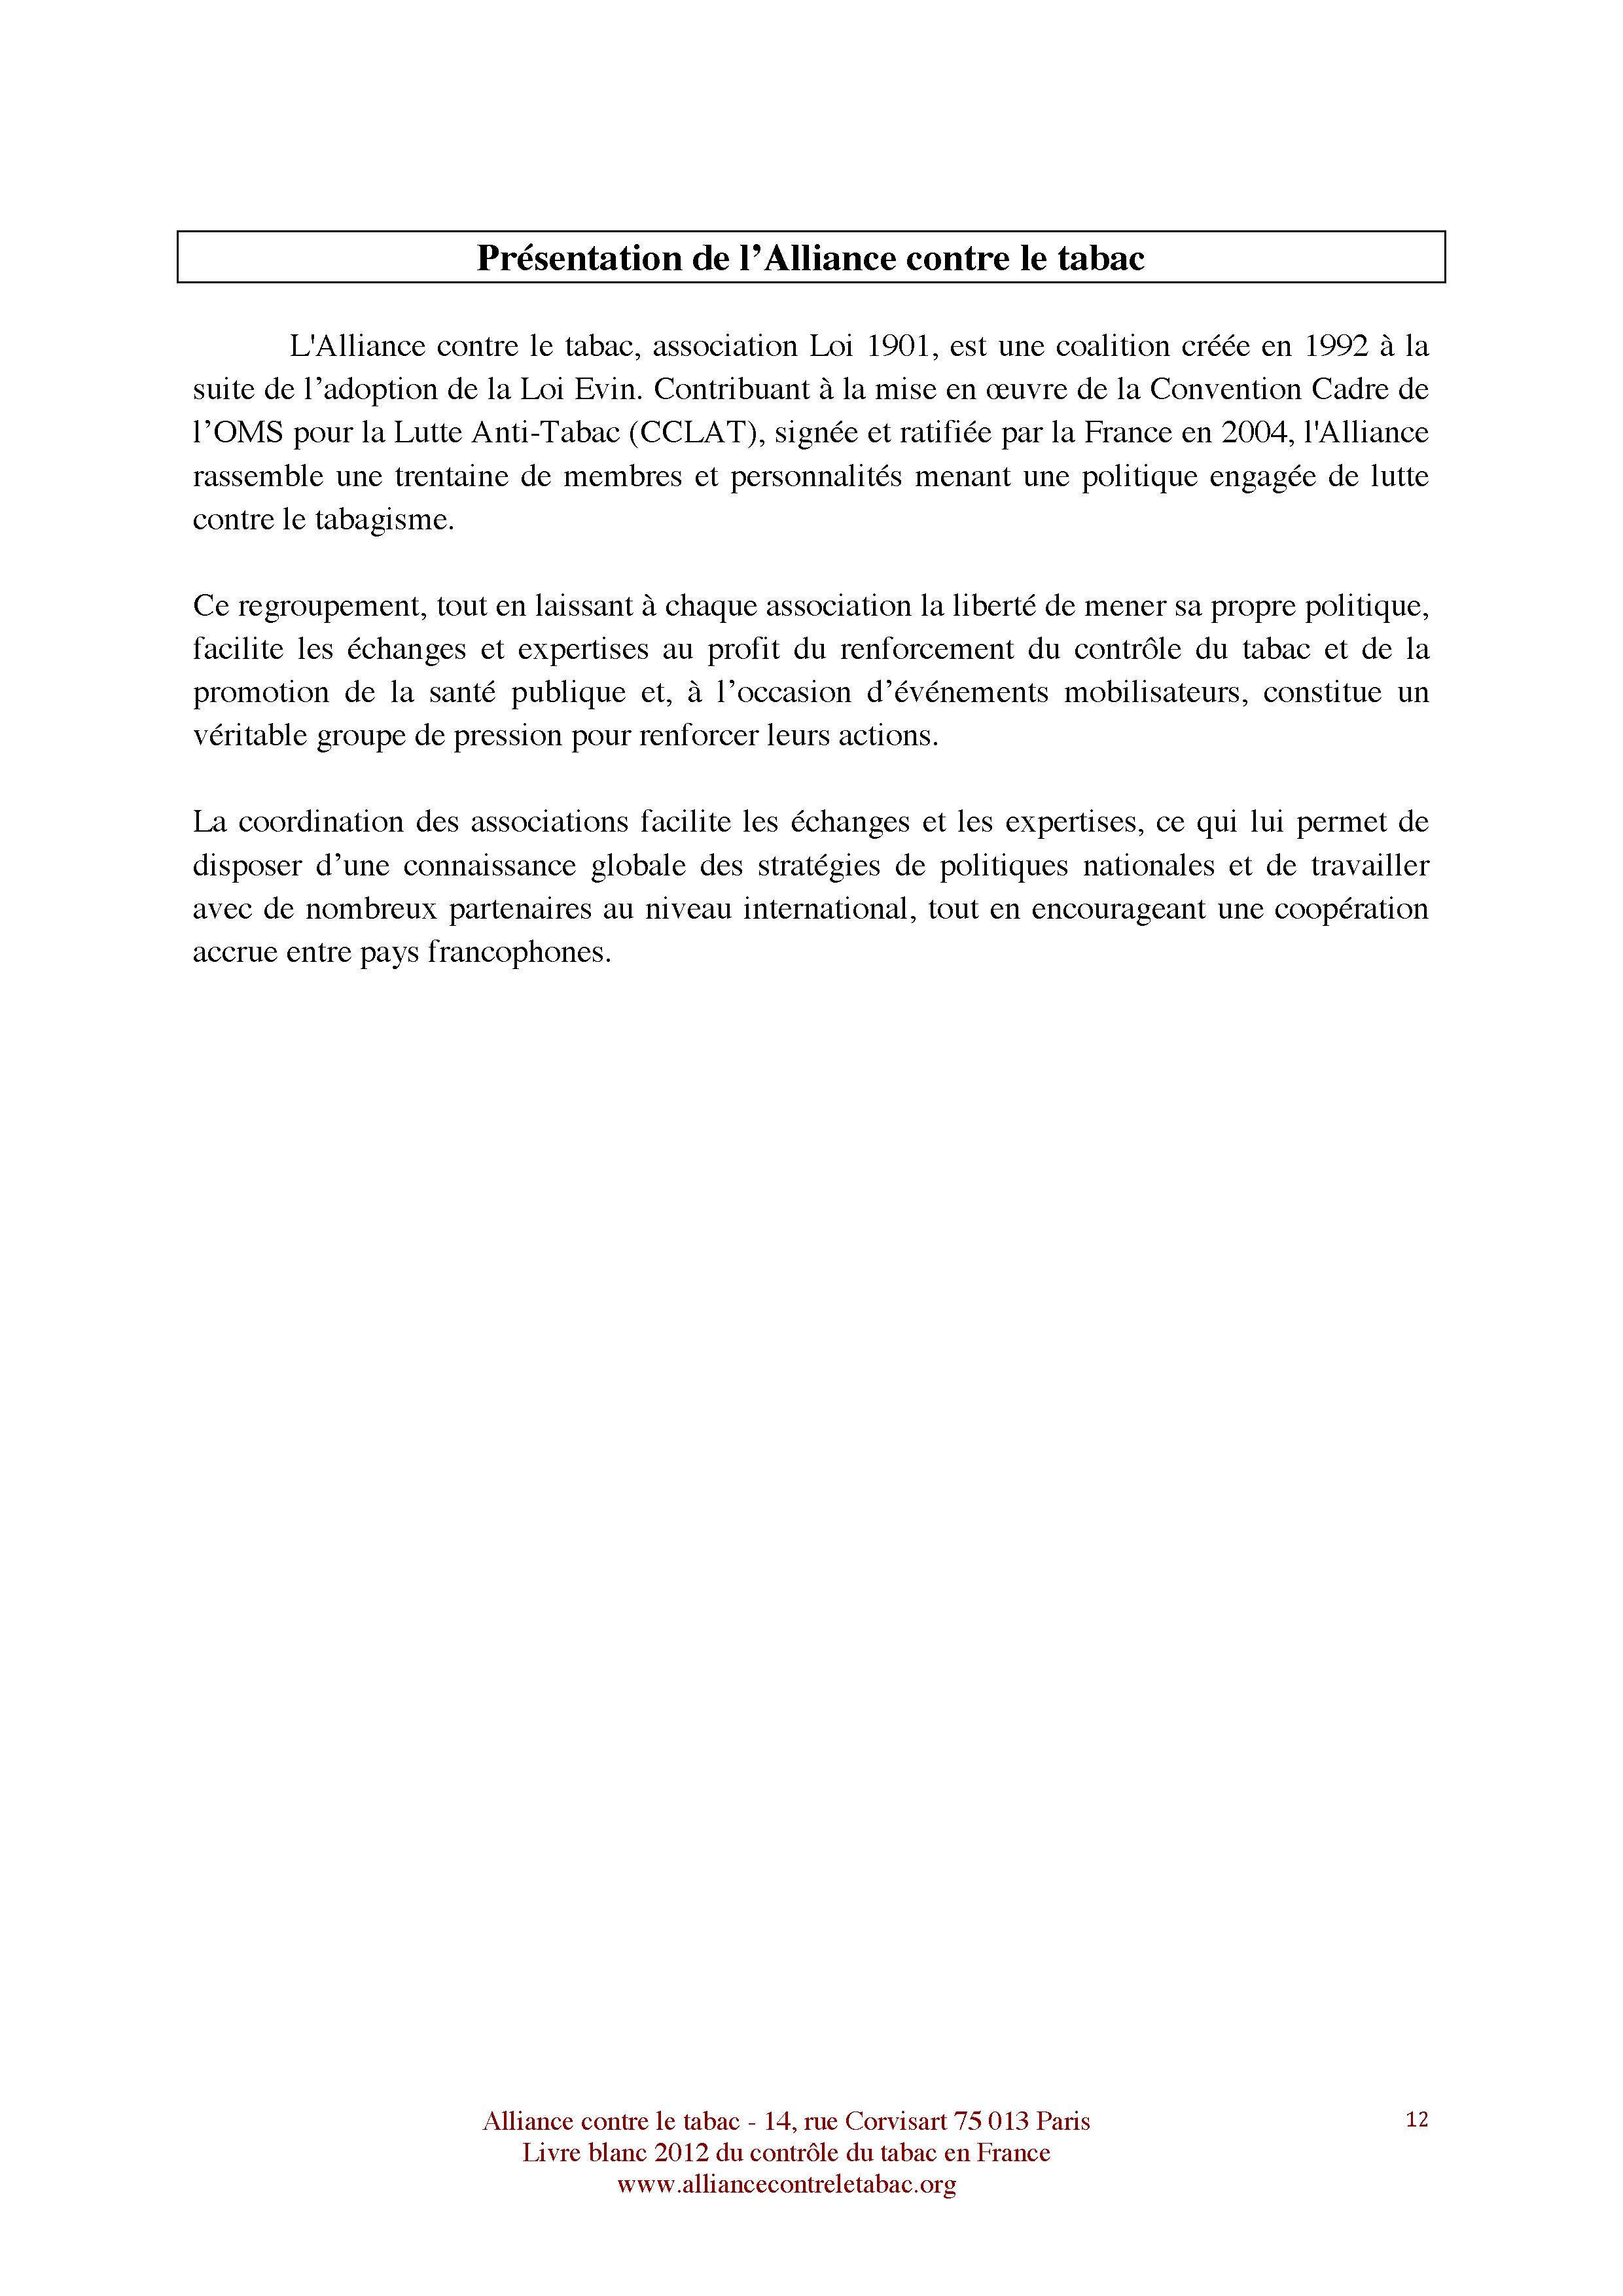 Alliance-dossier-presse_livre-blanc-22mars2012_Page_12.jpg